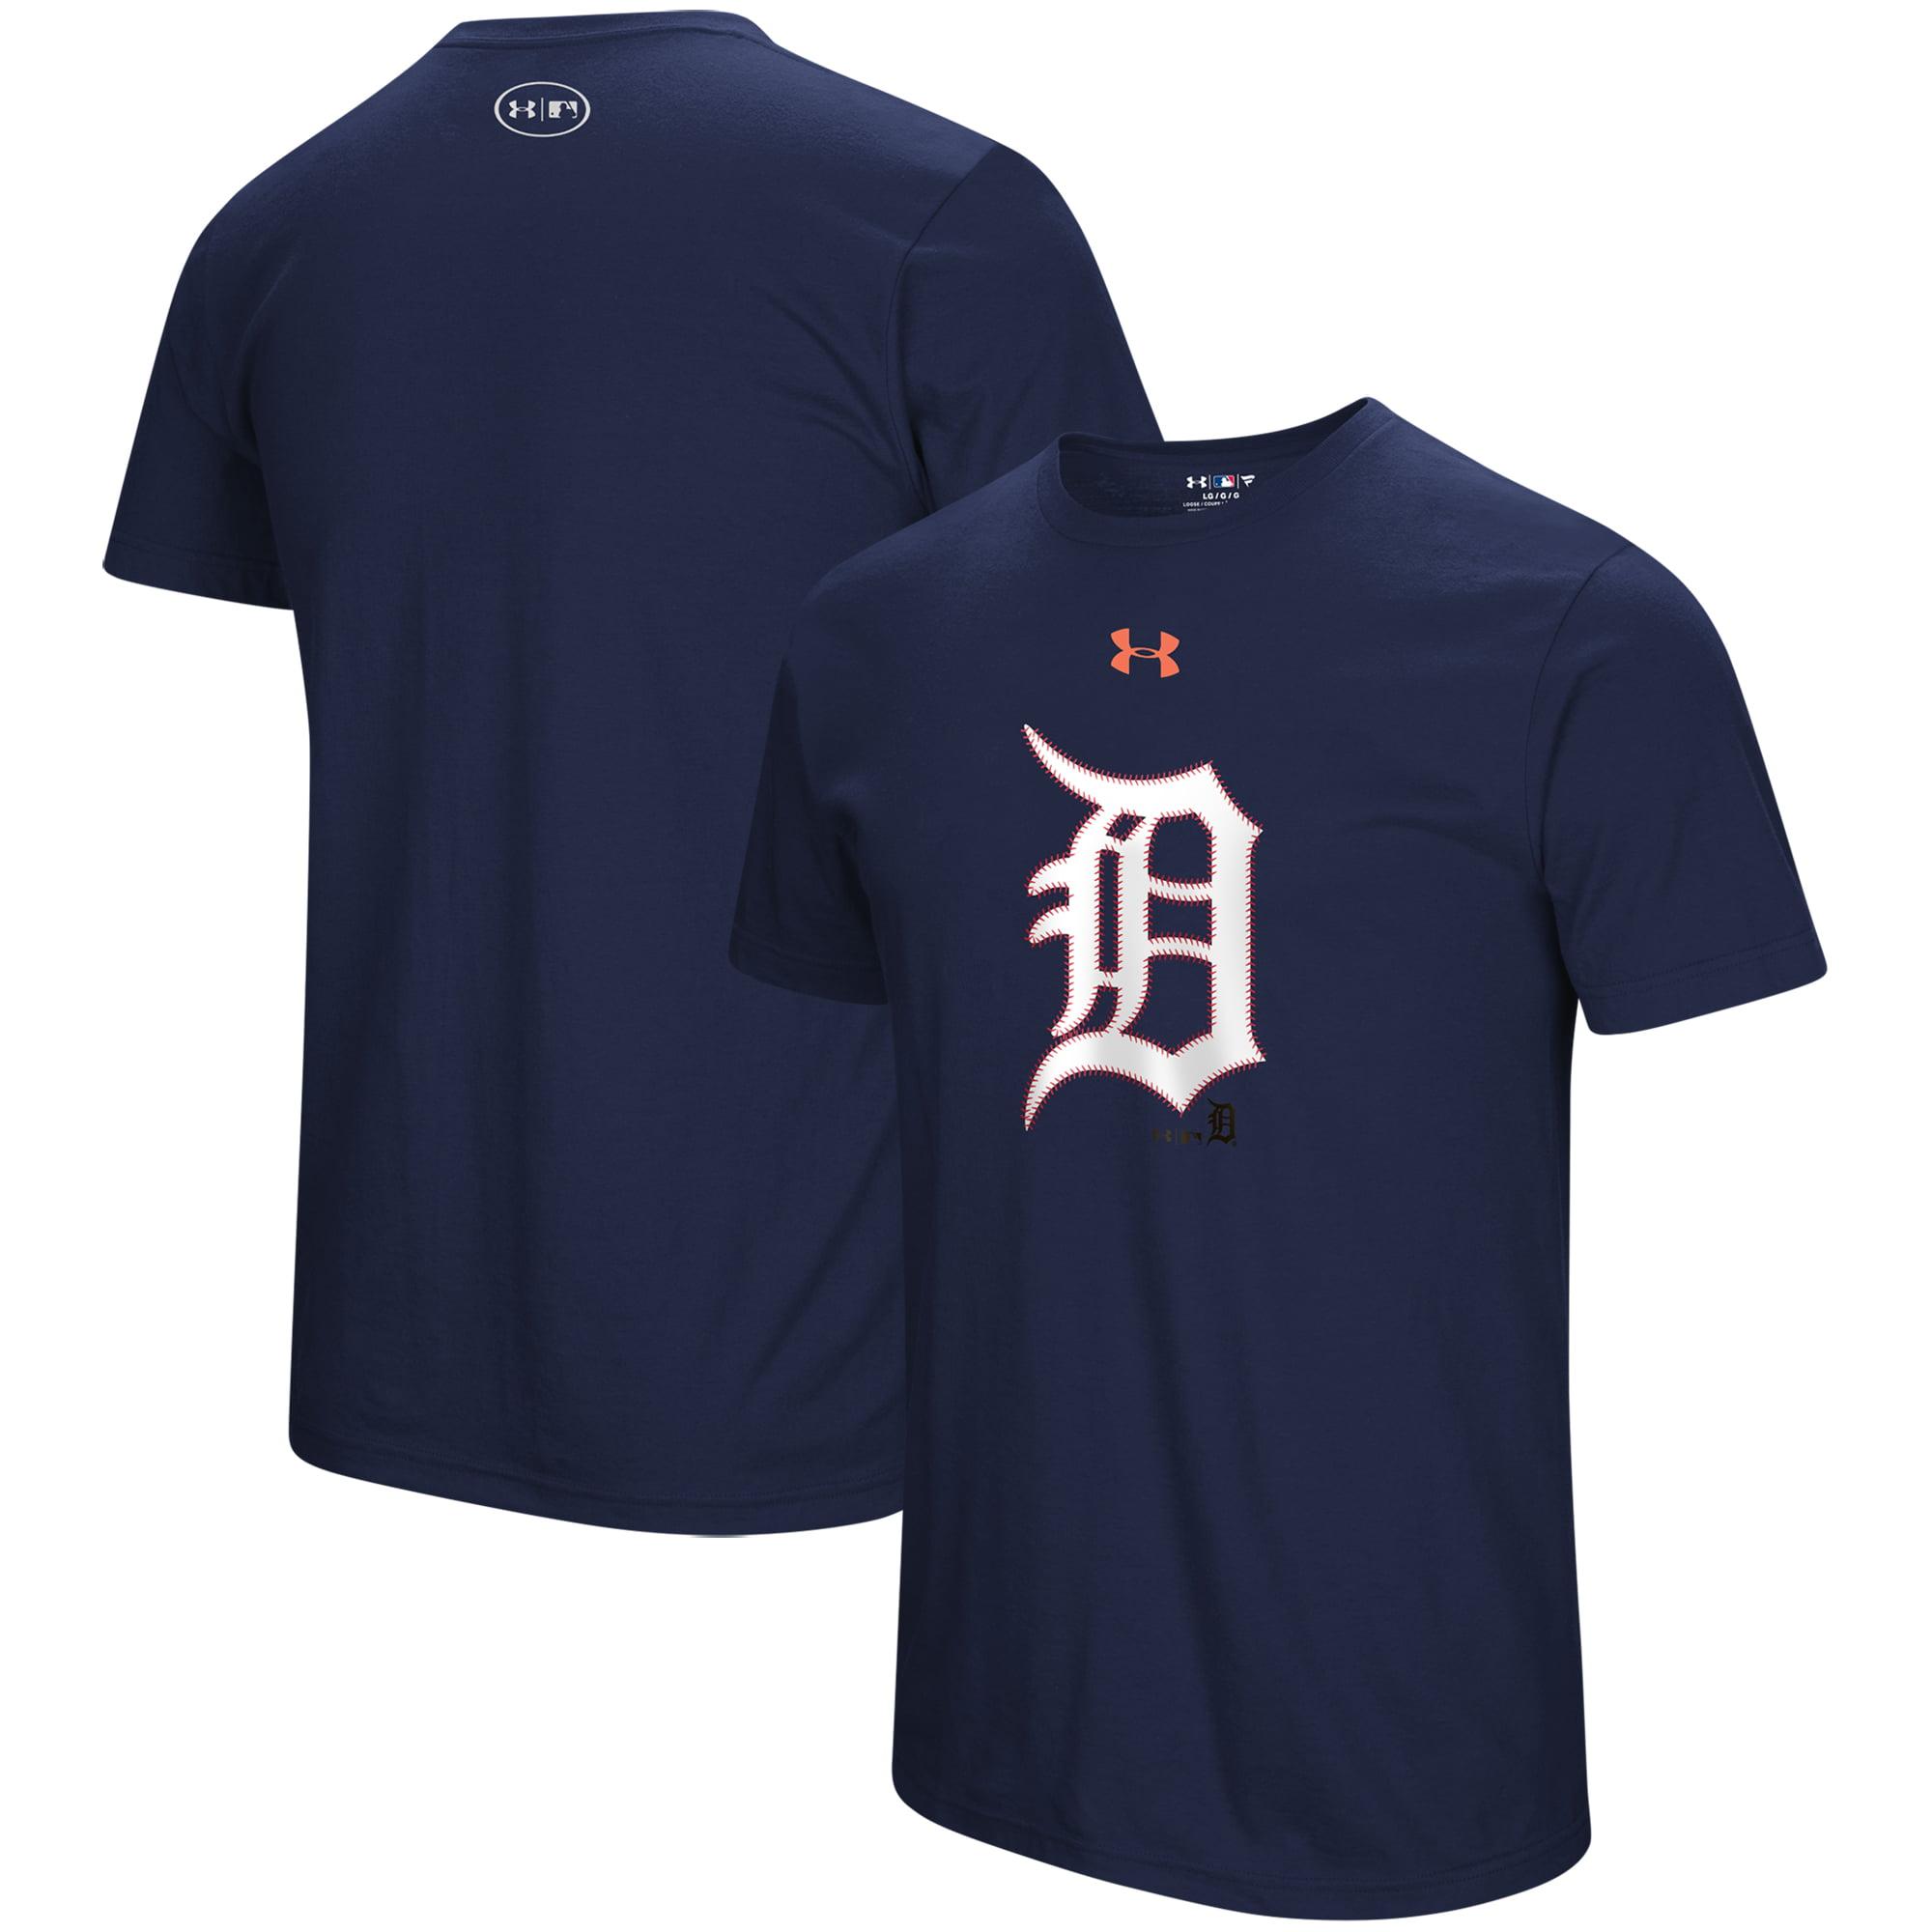 Detroit Tigers Under Armour Passion Stitch Logo Tri-Blend T-Shirt - Navy